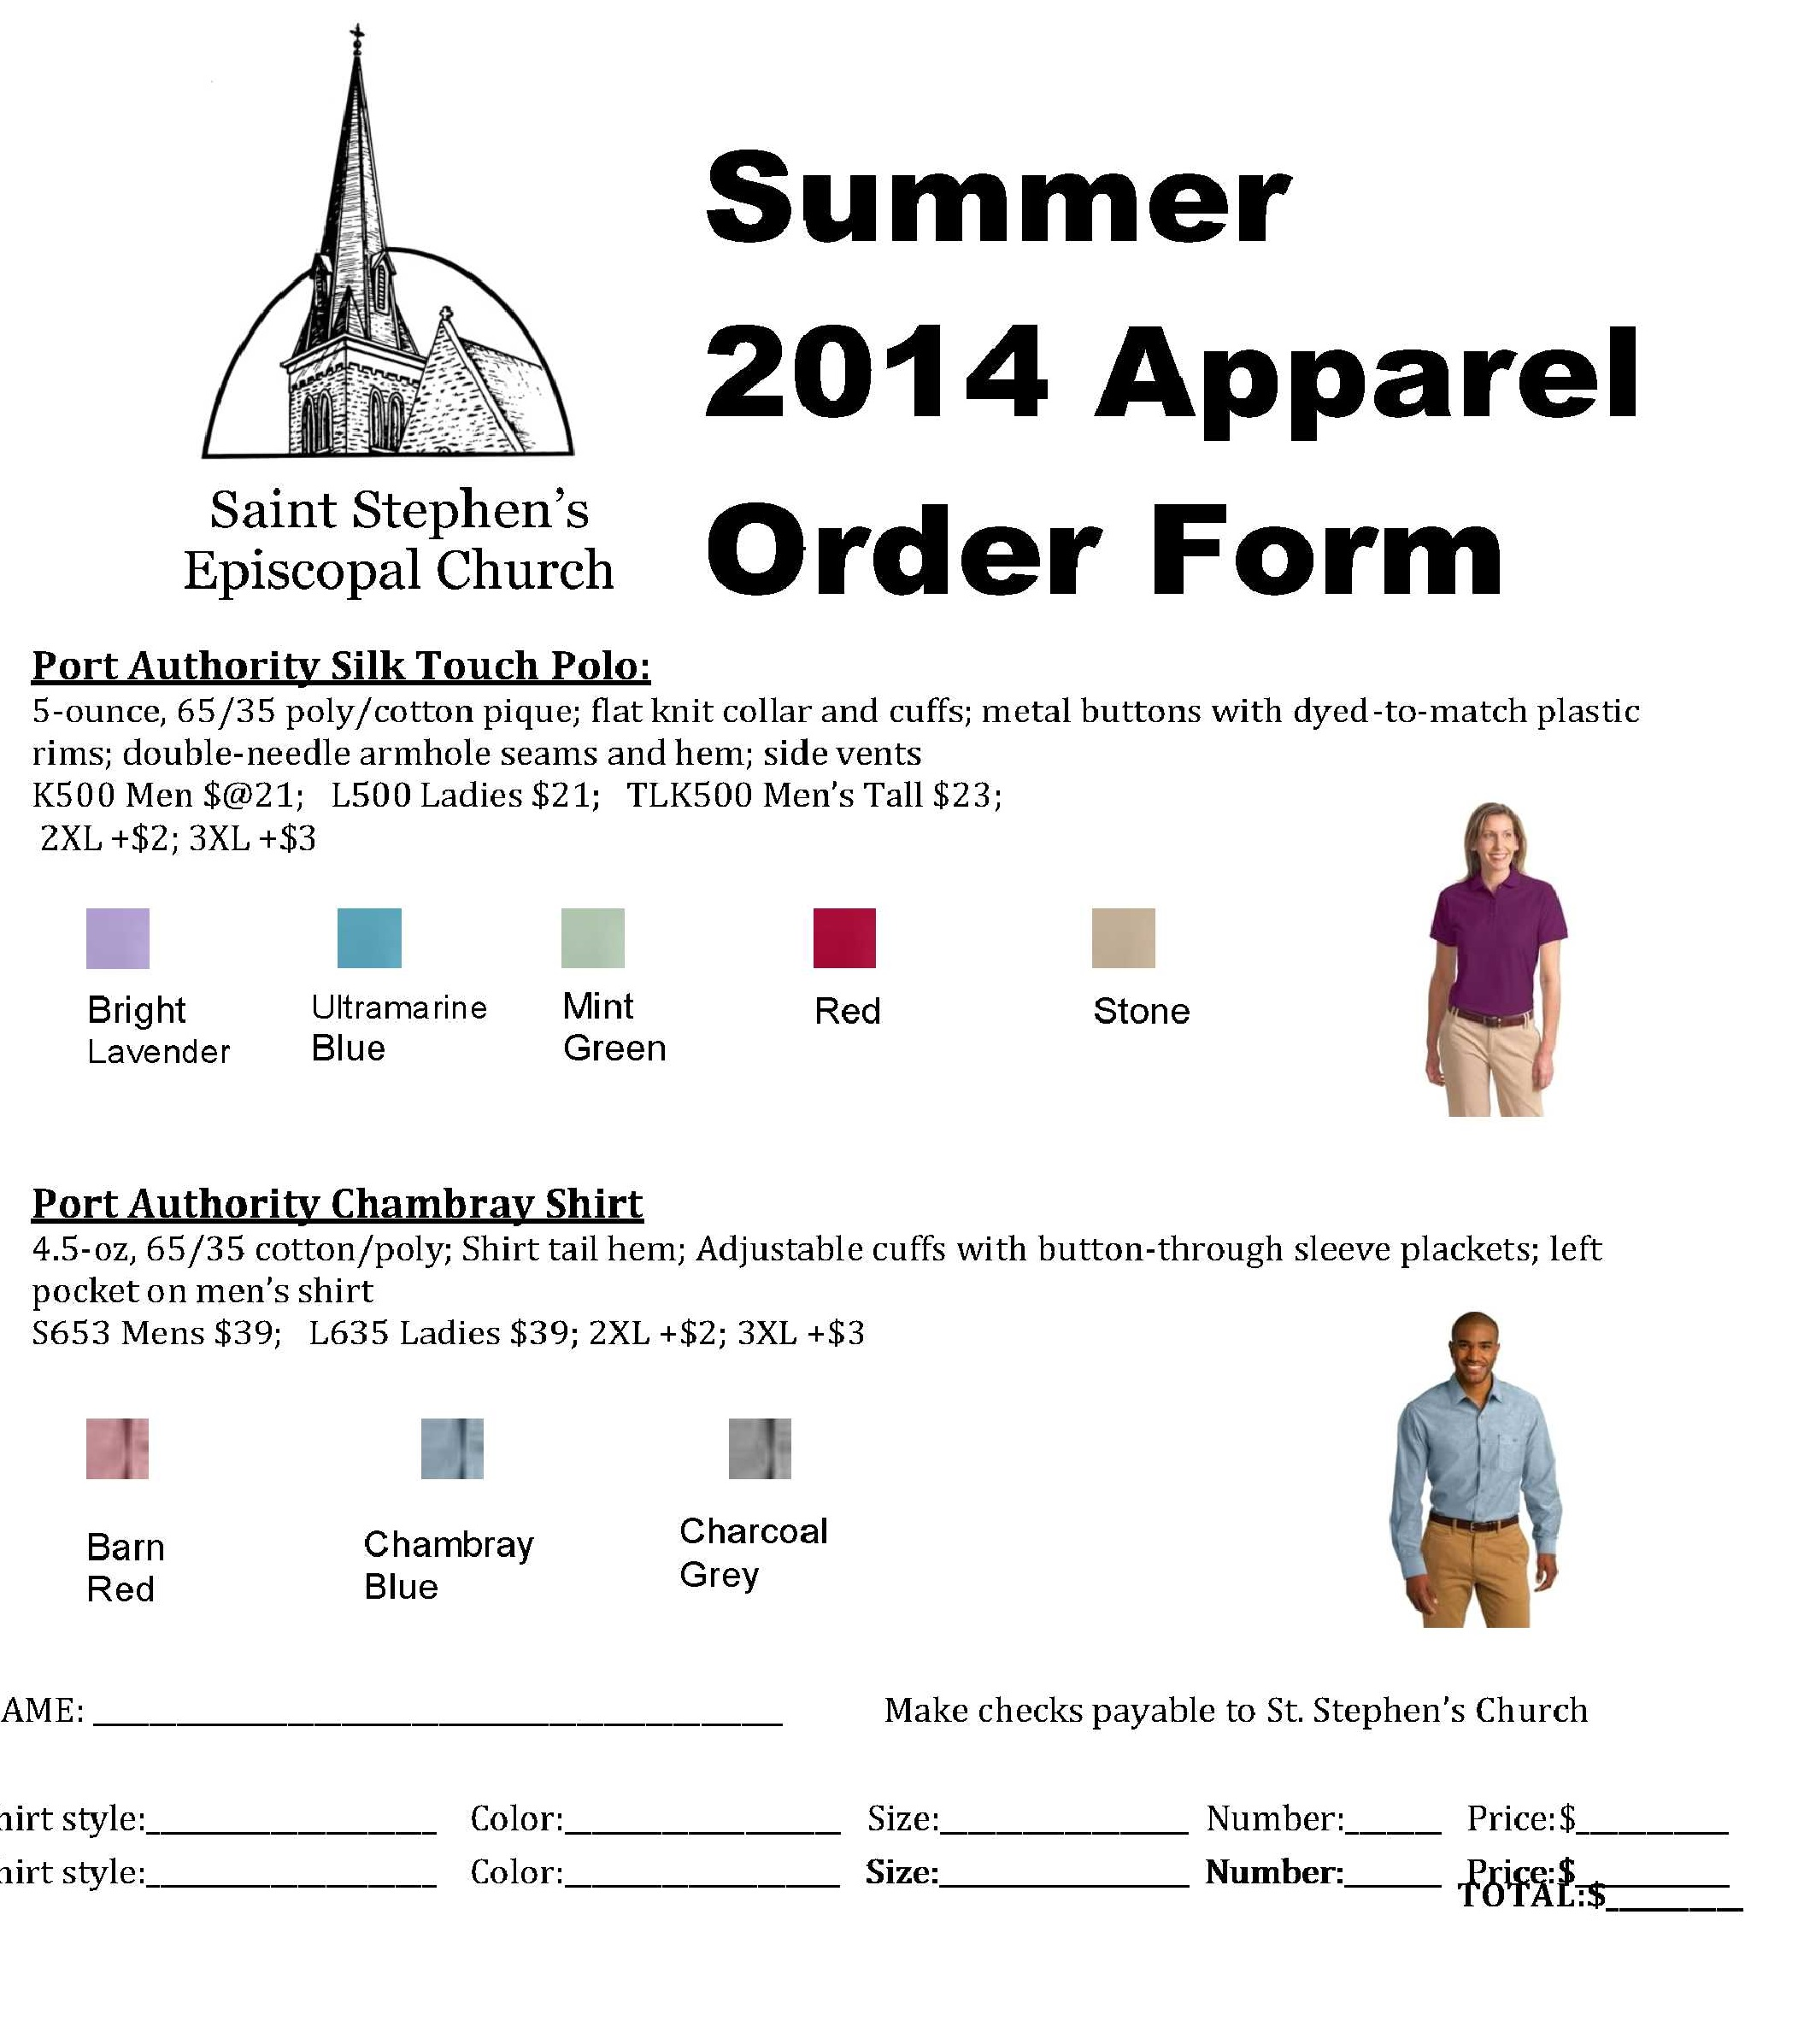 2014 apparel order st stephen's